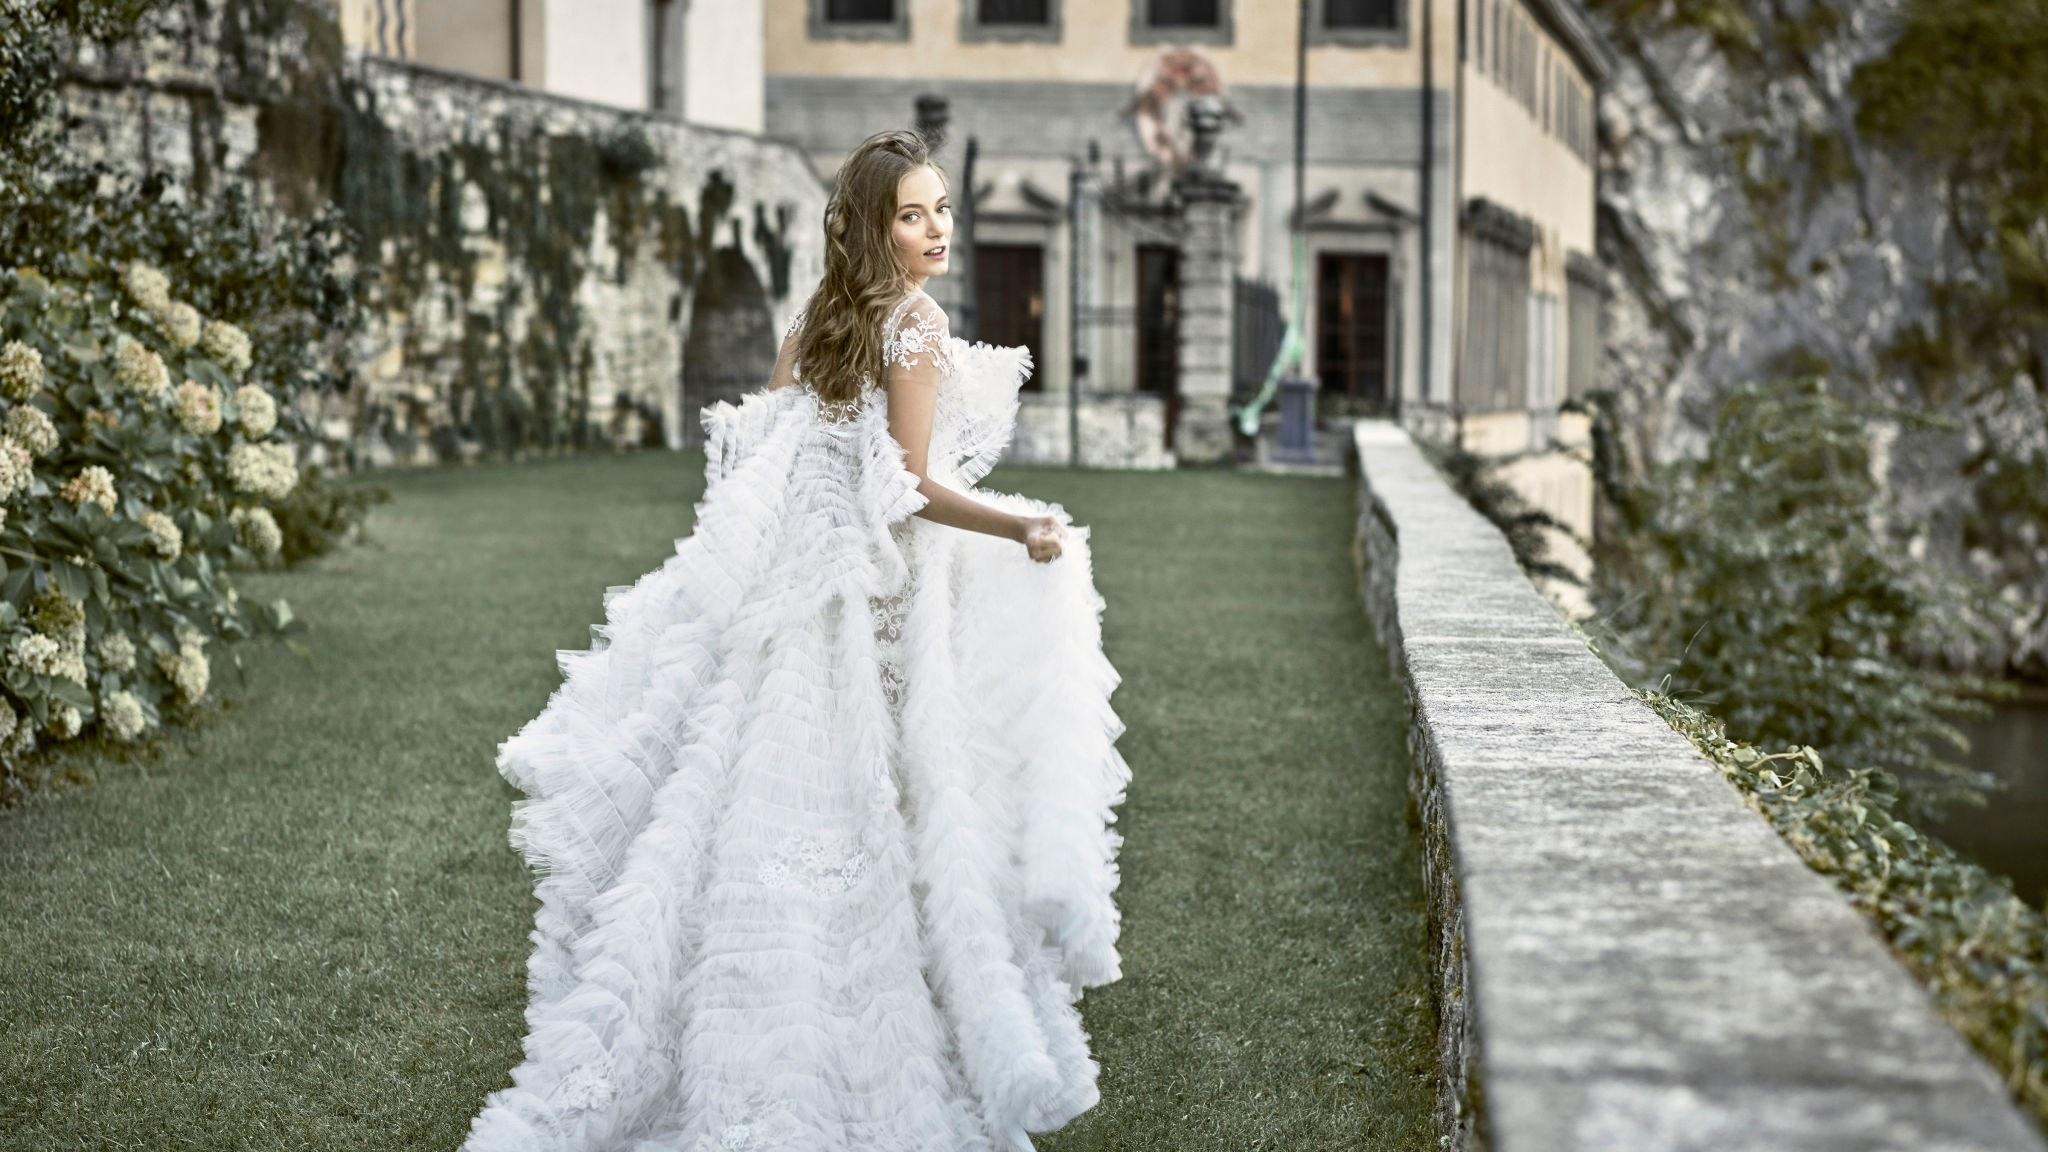 Model Gaun Muslimah Pengantin Jxdu 20 Ide Model Gaun Pengantin Untuk Wujudkan Pernikahan